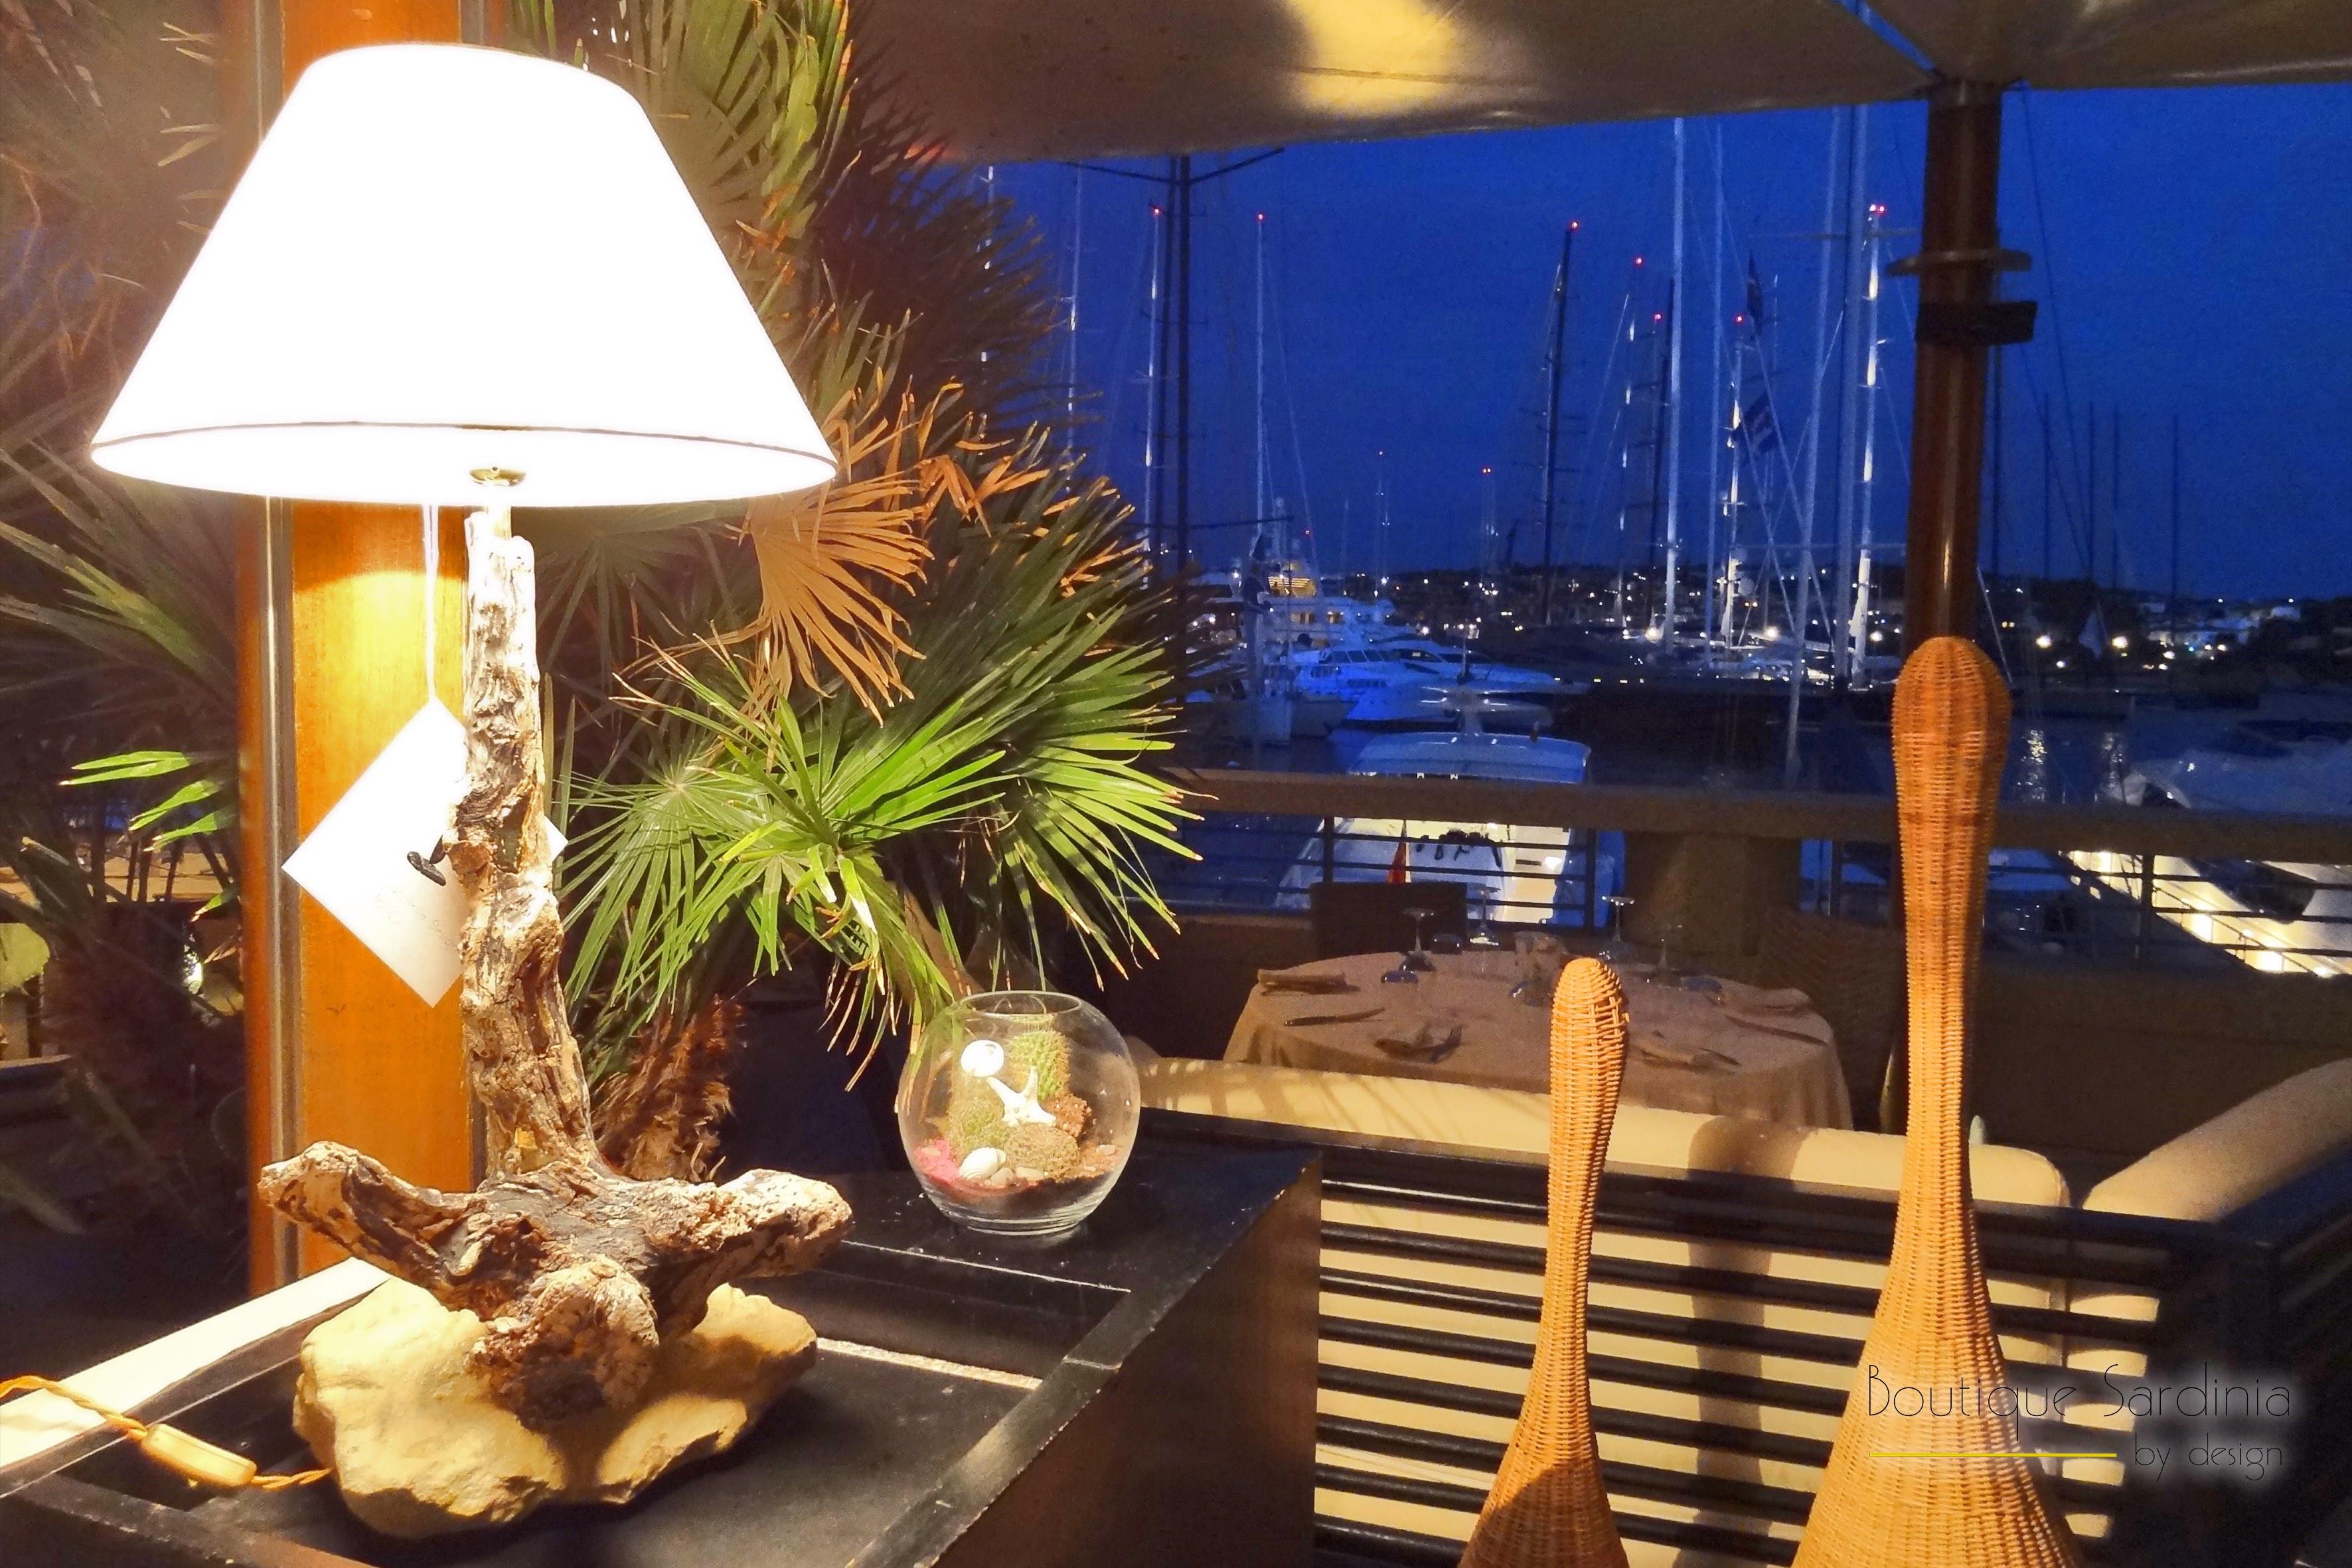 Yacht Club Costa smeralda Portocervo